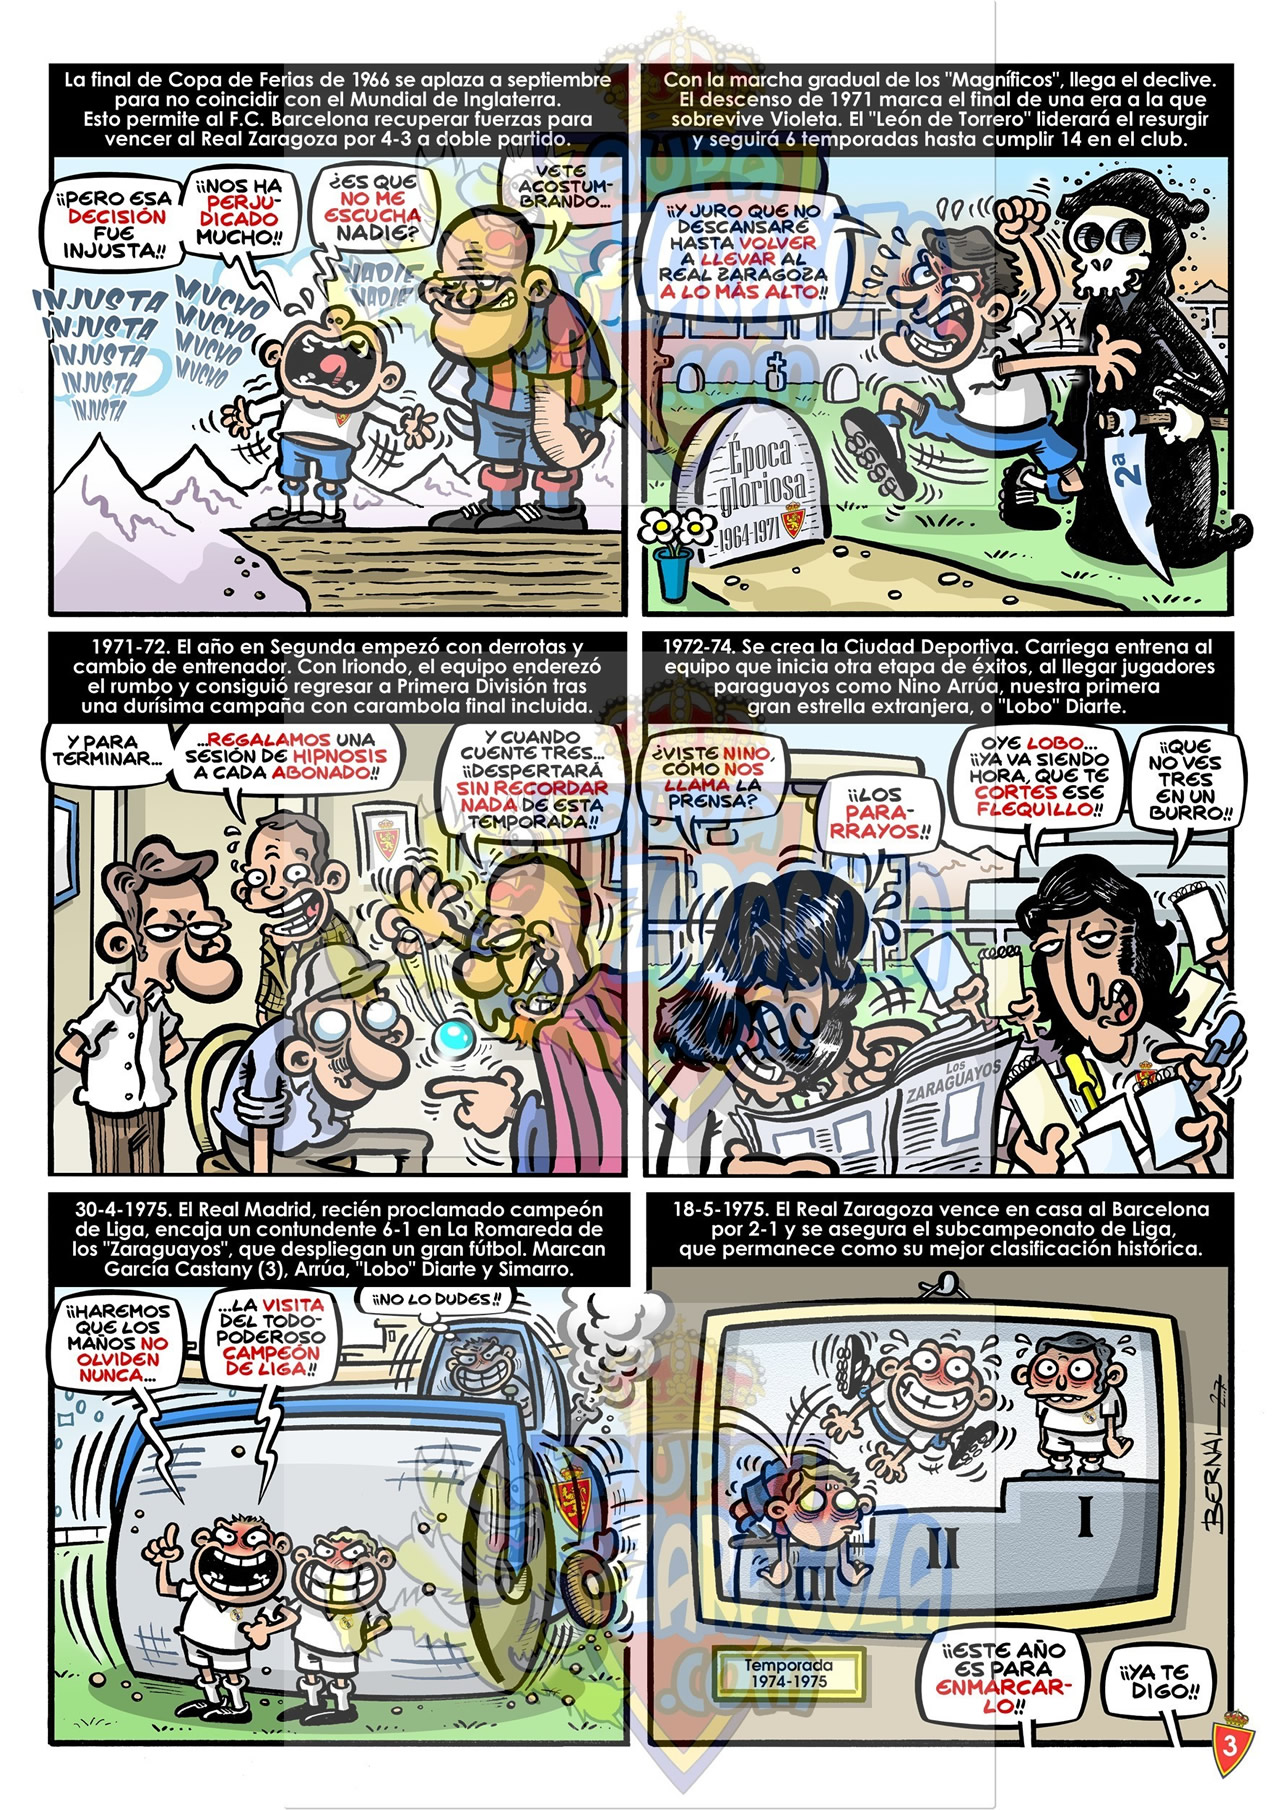 comic 75 años real zaragoza 3